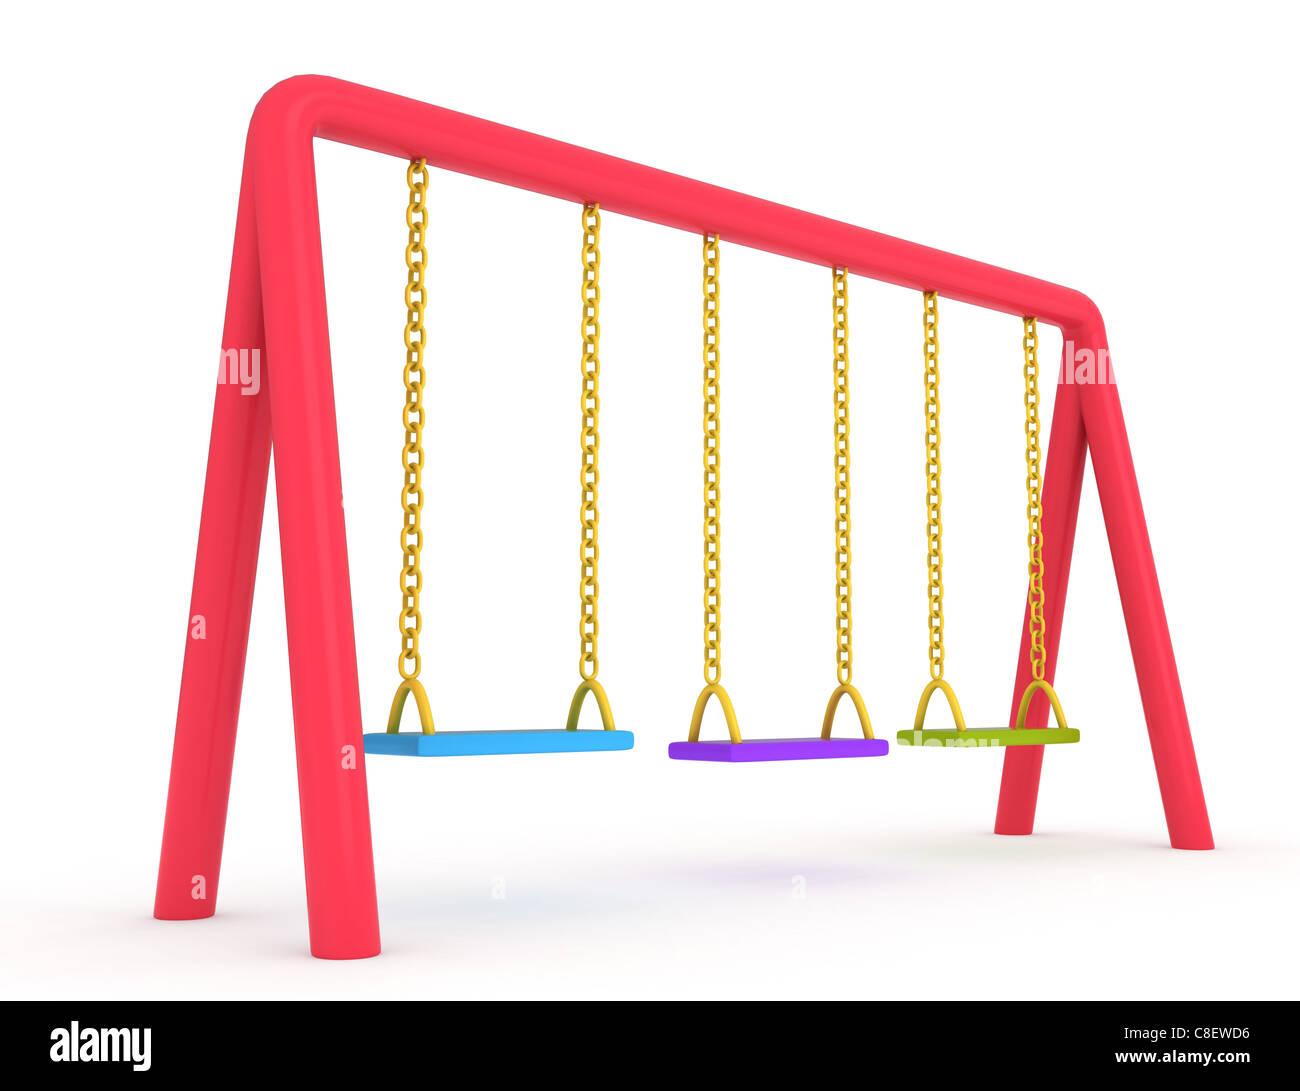 Ilustración 3D de columpios Imagen De Stock